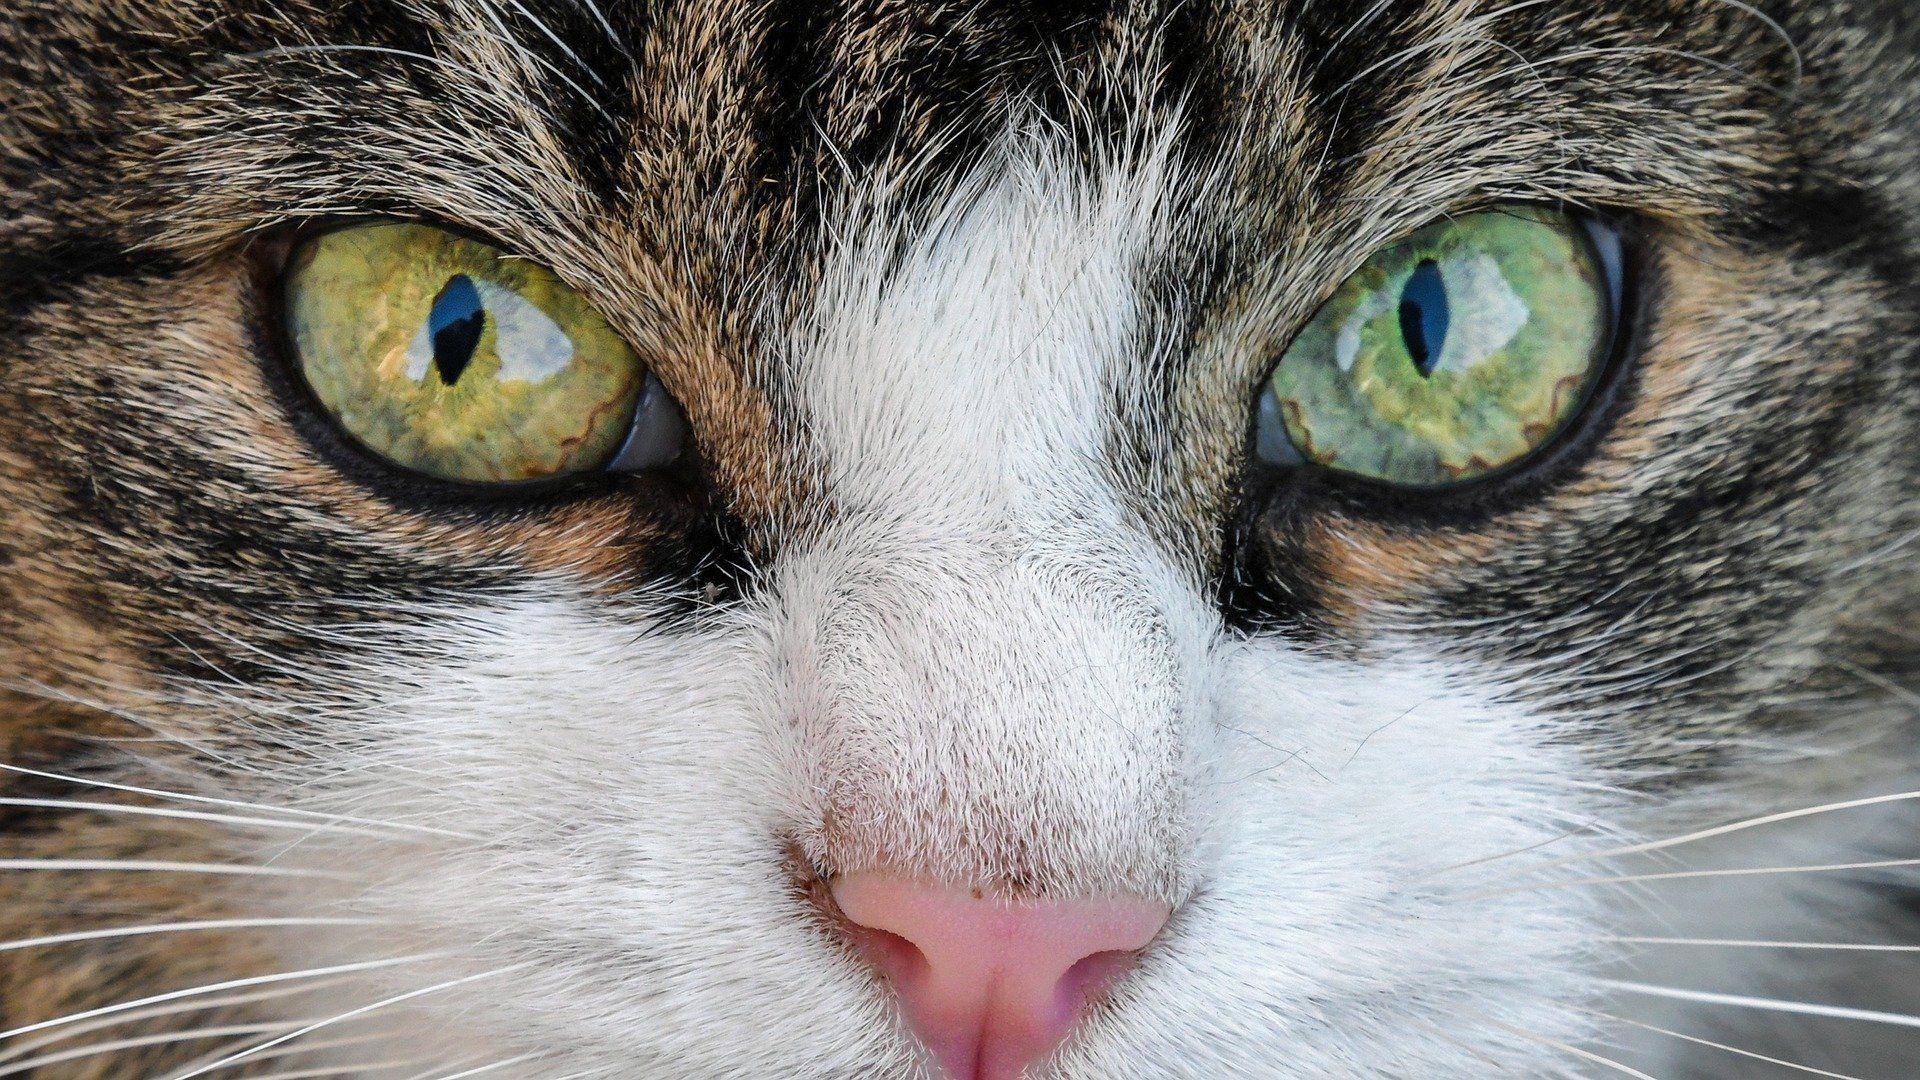 Cantidad De Comida Diaria Para Gatos In 2020 Fun Facts About Animals Funny Cute Cats Cute Cat Gif